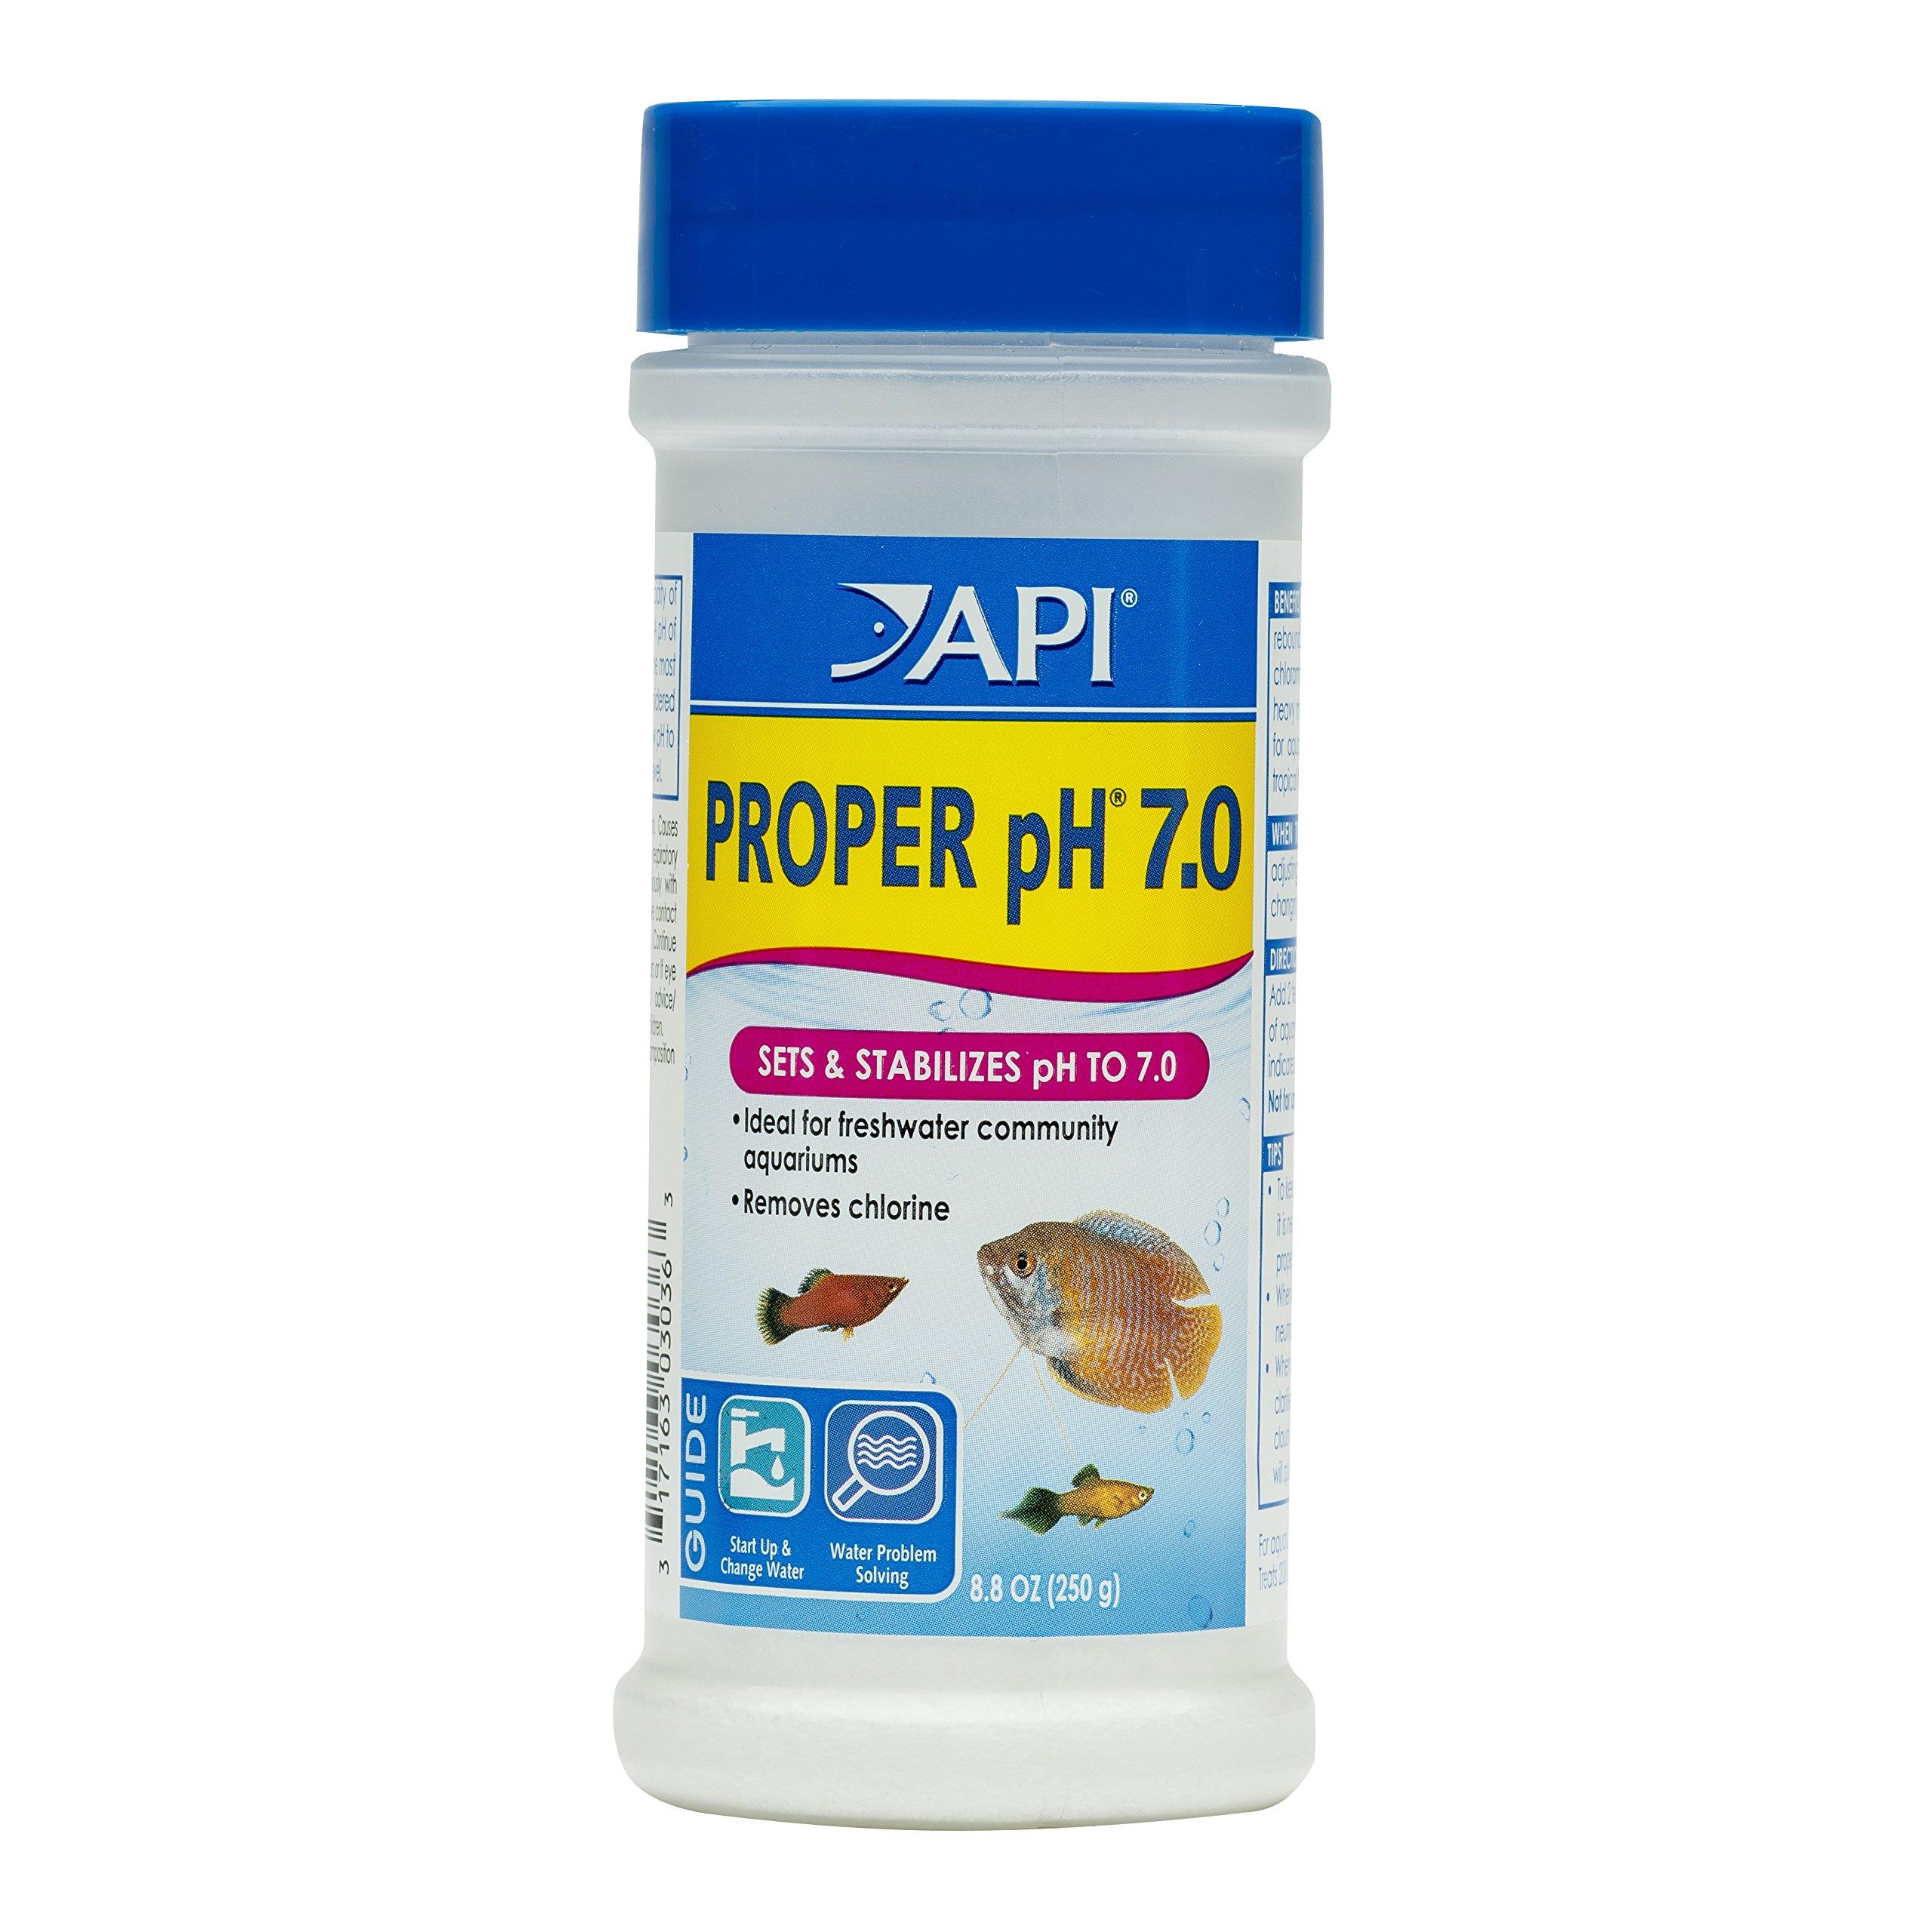 API PROPER pH 7.0 Freshwater Aquarium Water pH Stabilizer 8.8-Ounce Container